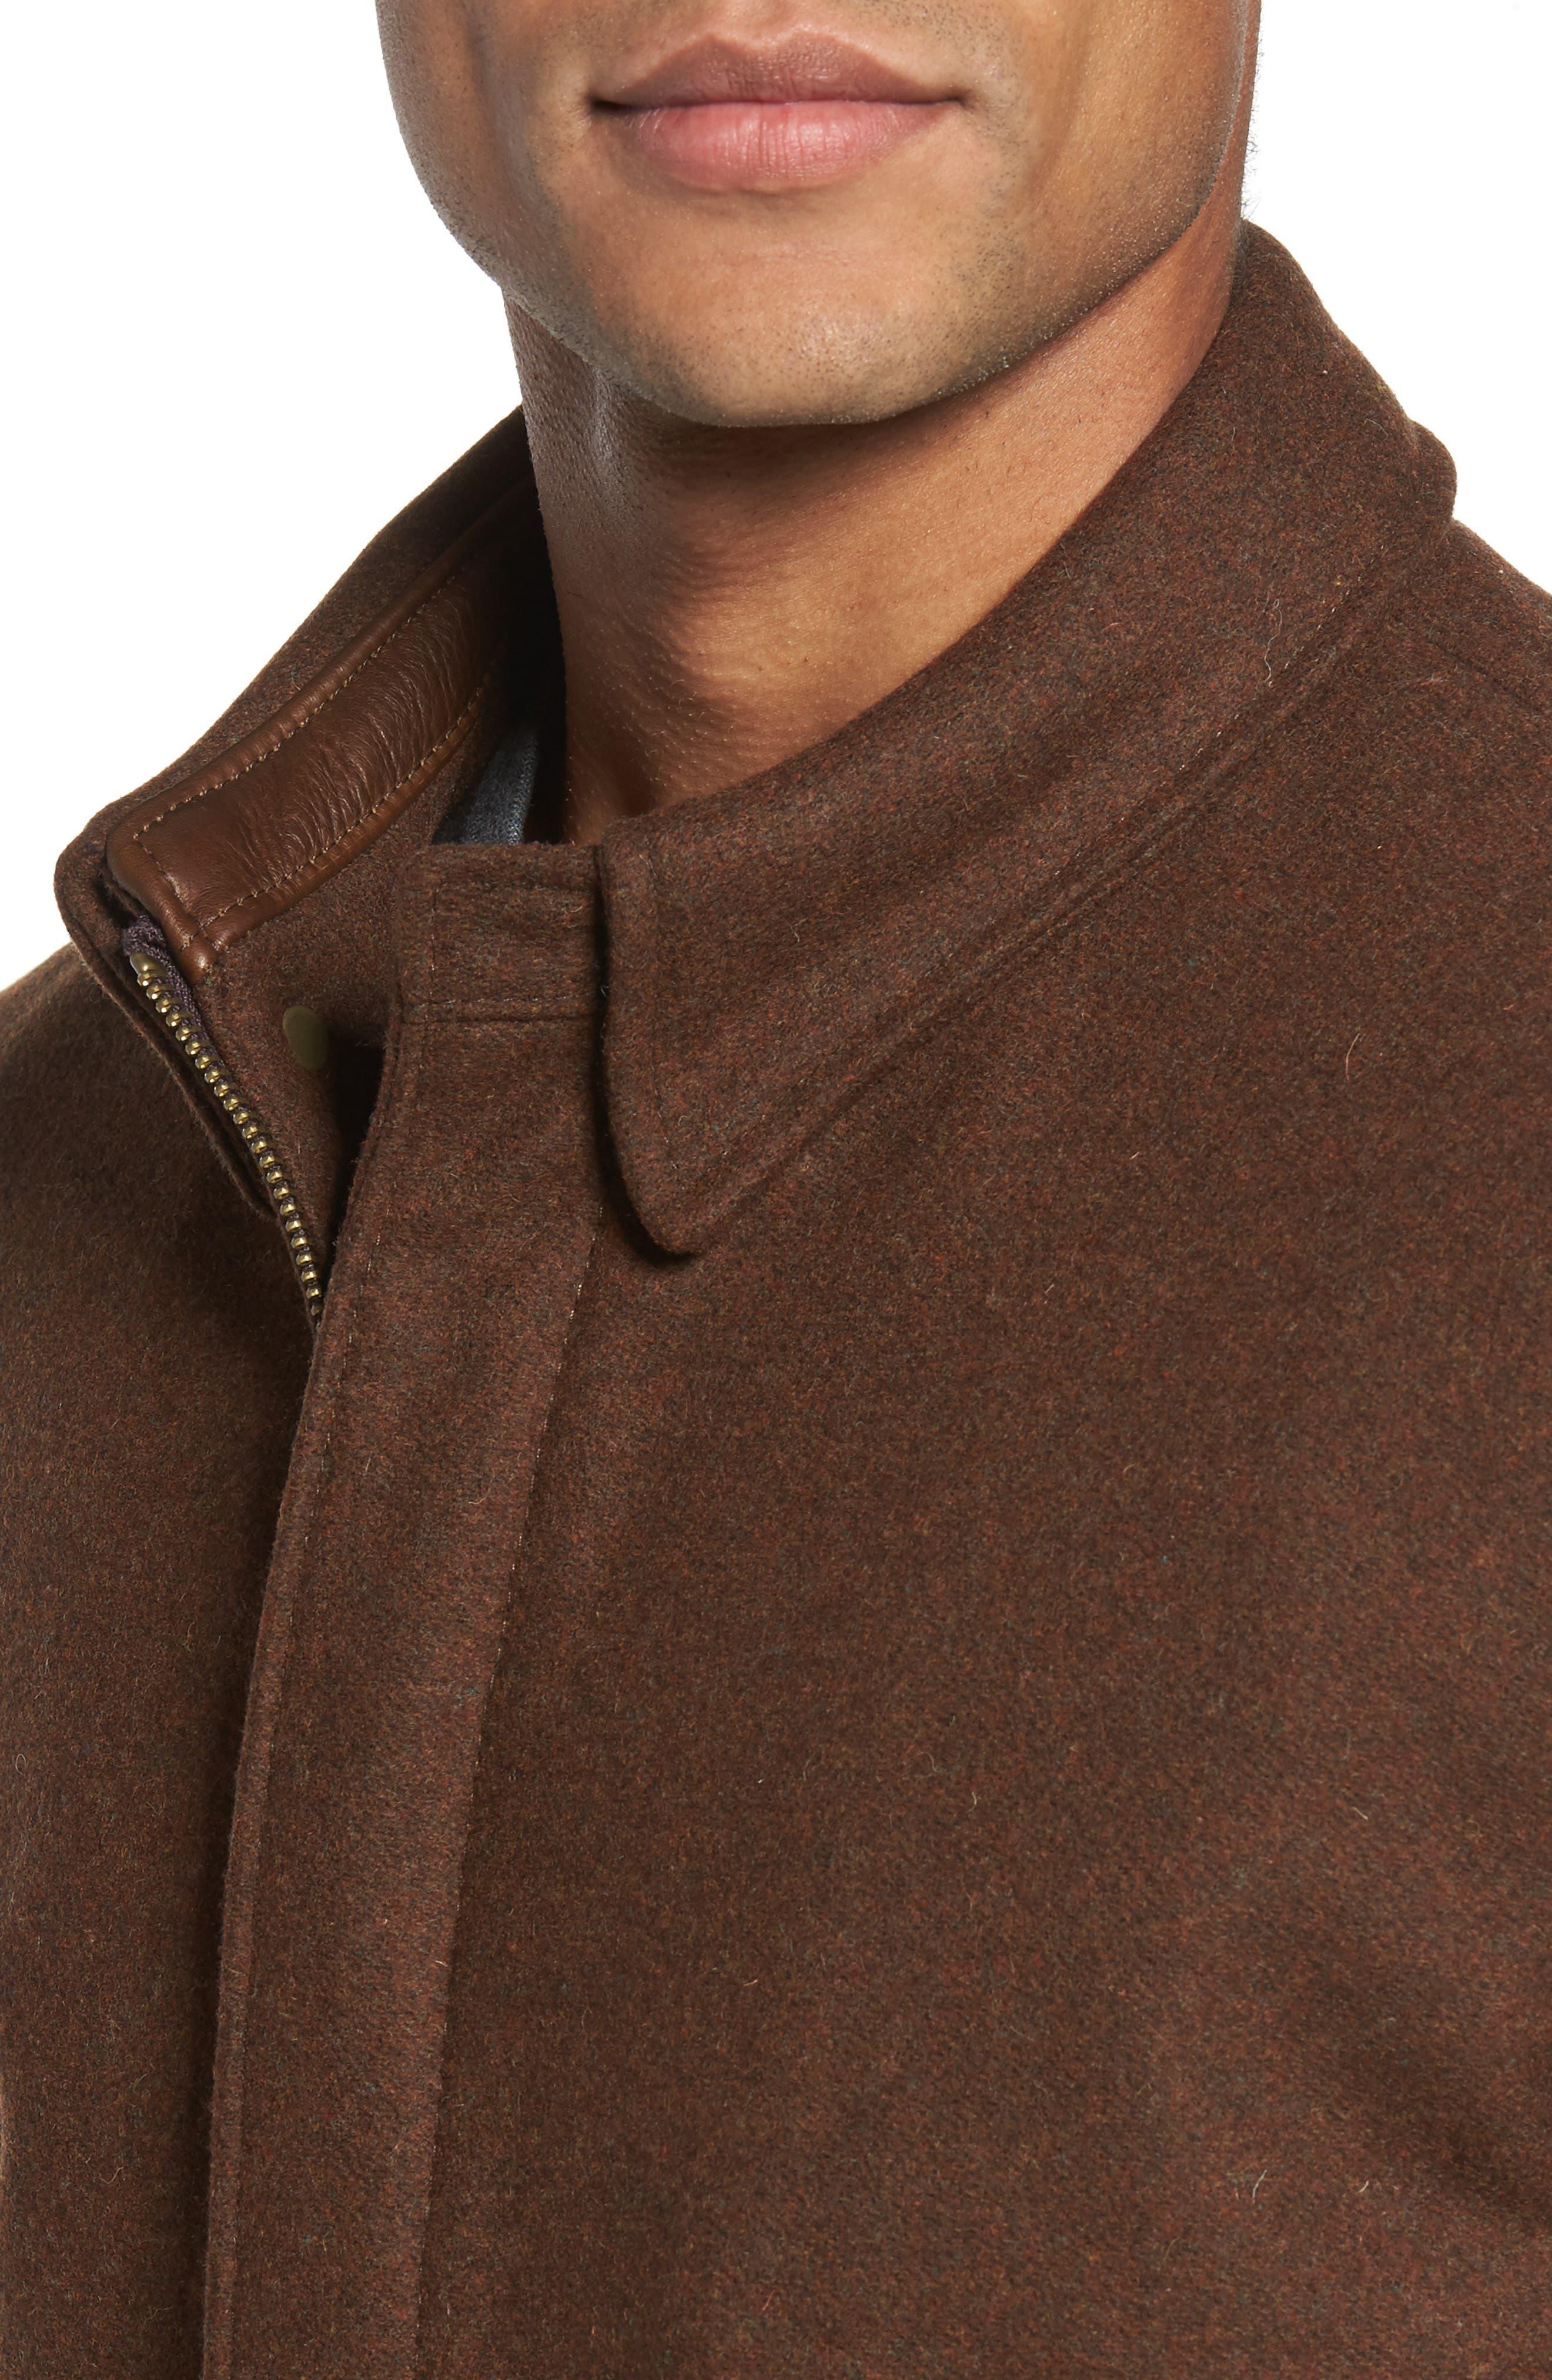 Liberty Wool Blend Zip Front Jacket,                             Alternate thumbnail 4, color,                             Brown